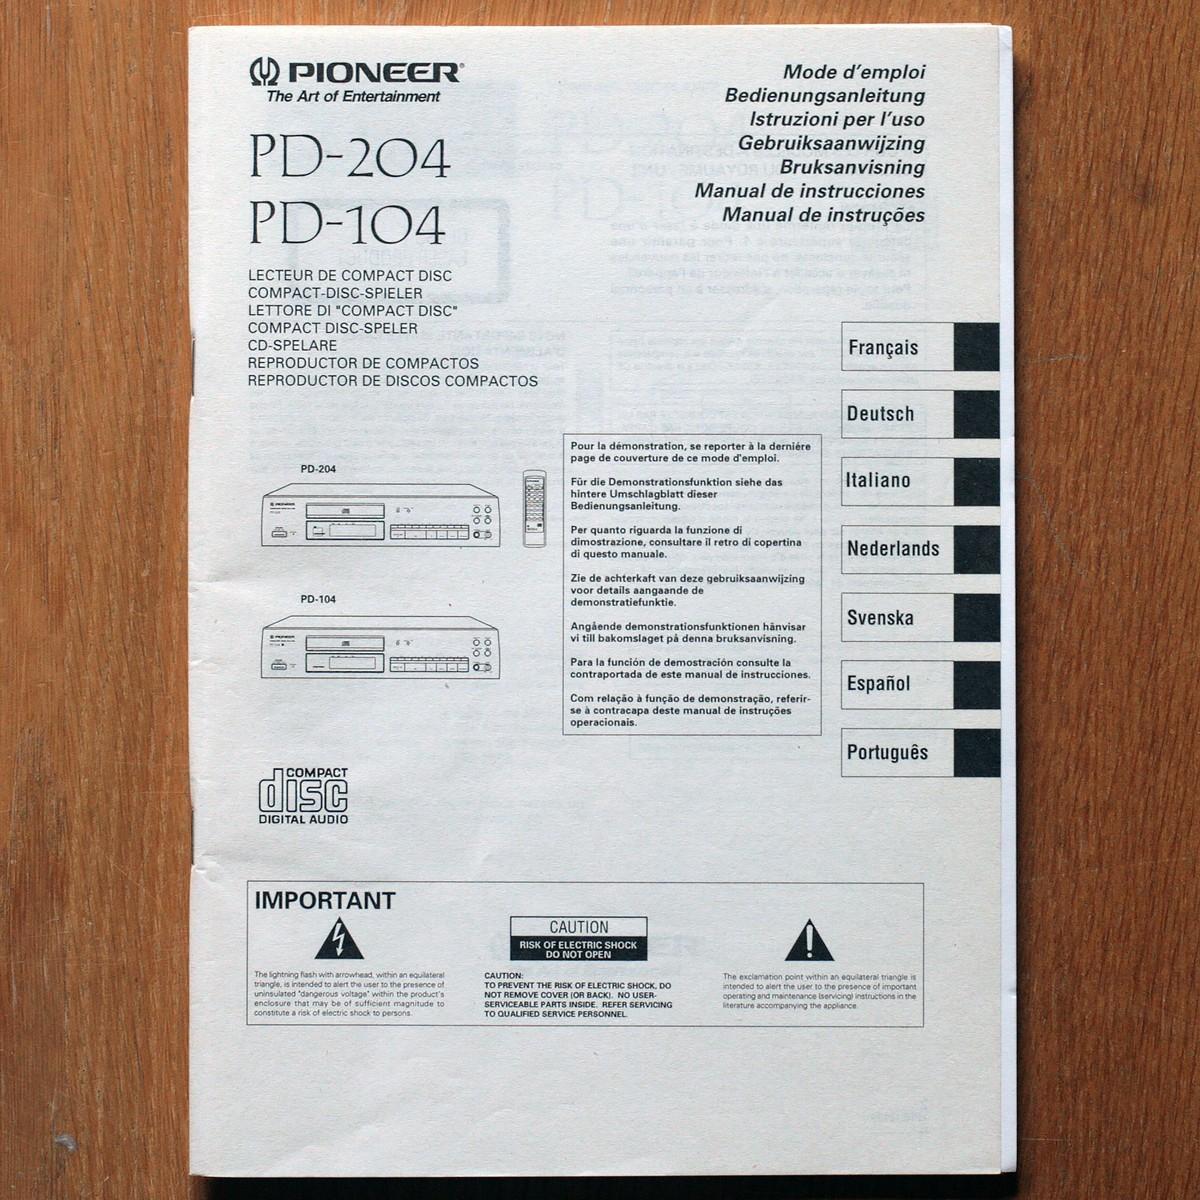 Pioneer • Lecteur CD • PD-104 & PD-204 • Manuel utilisateur • User manual • Bedienungsanleitung • Gebruiksaanwijzing • Bruksanvisning • Manual de instrucciones